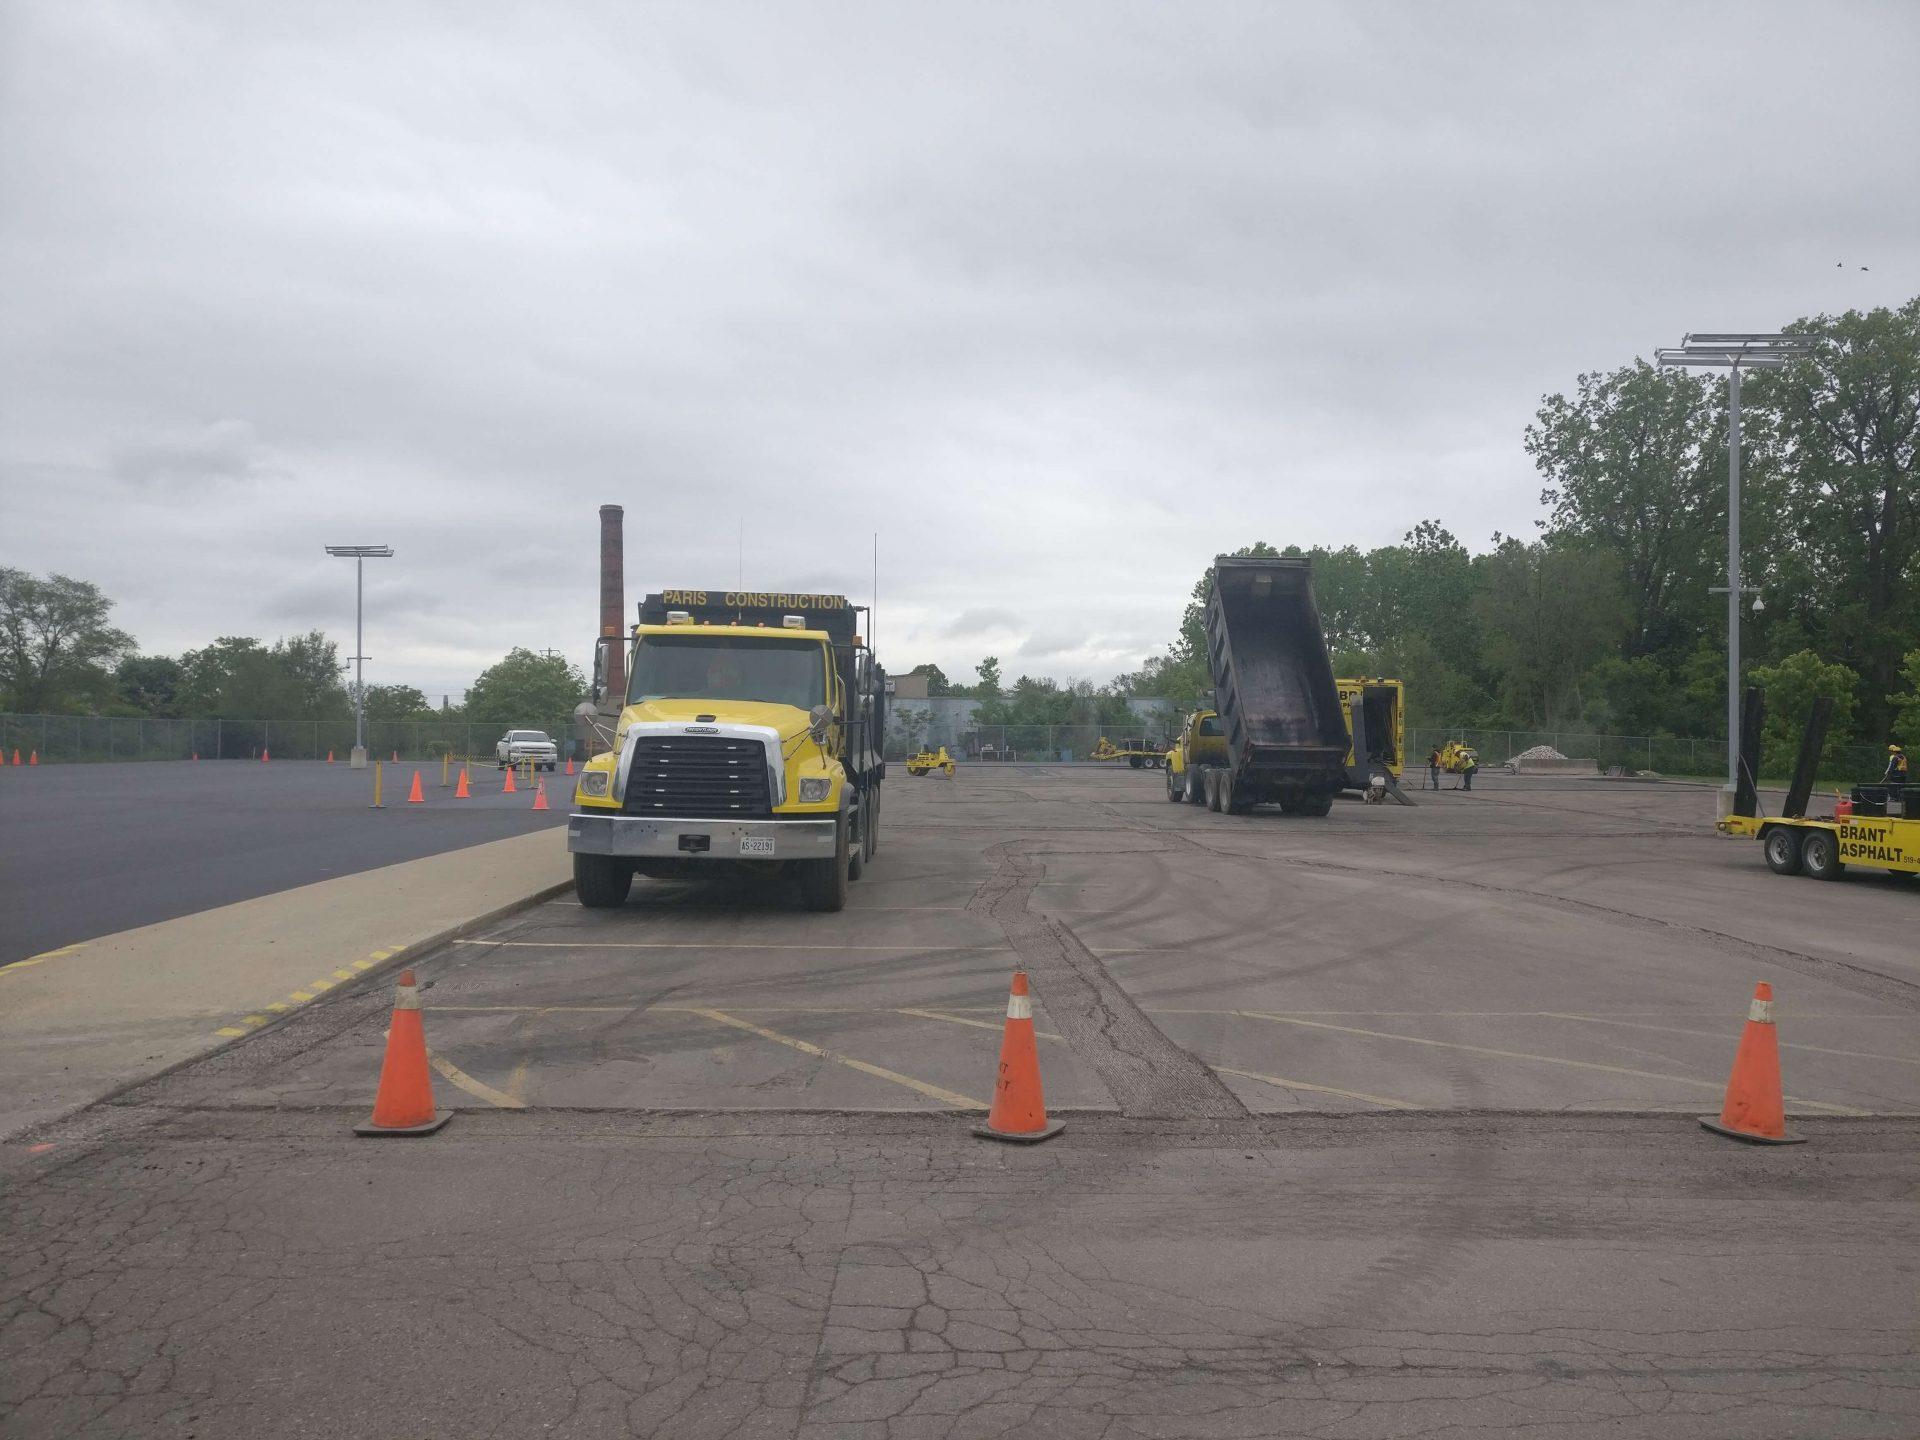 Trucks on construction site